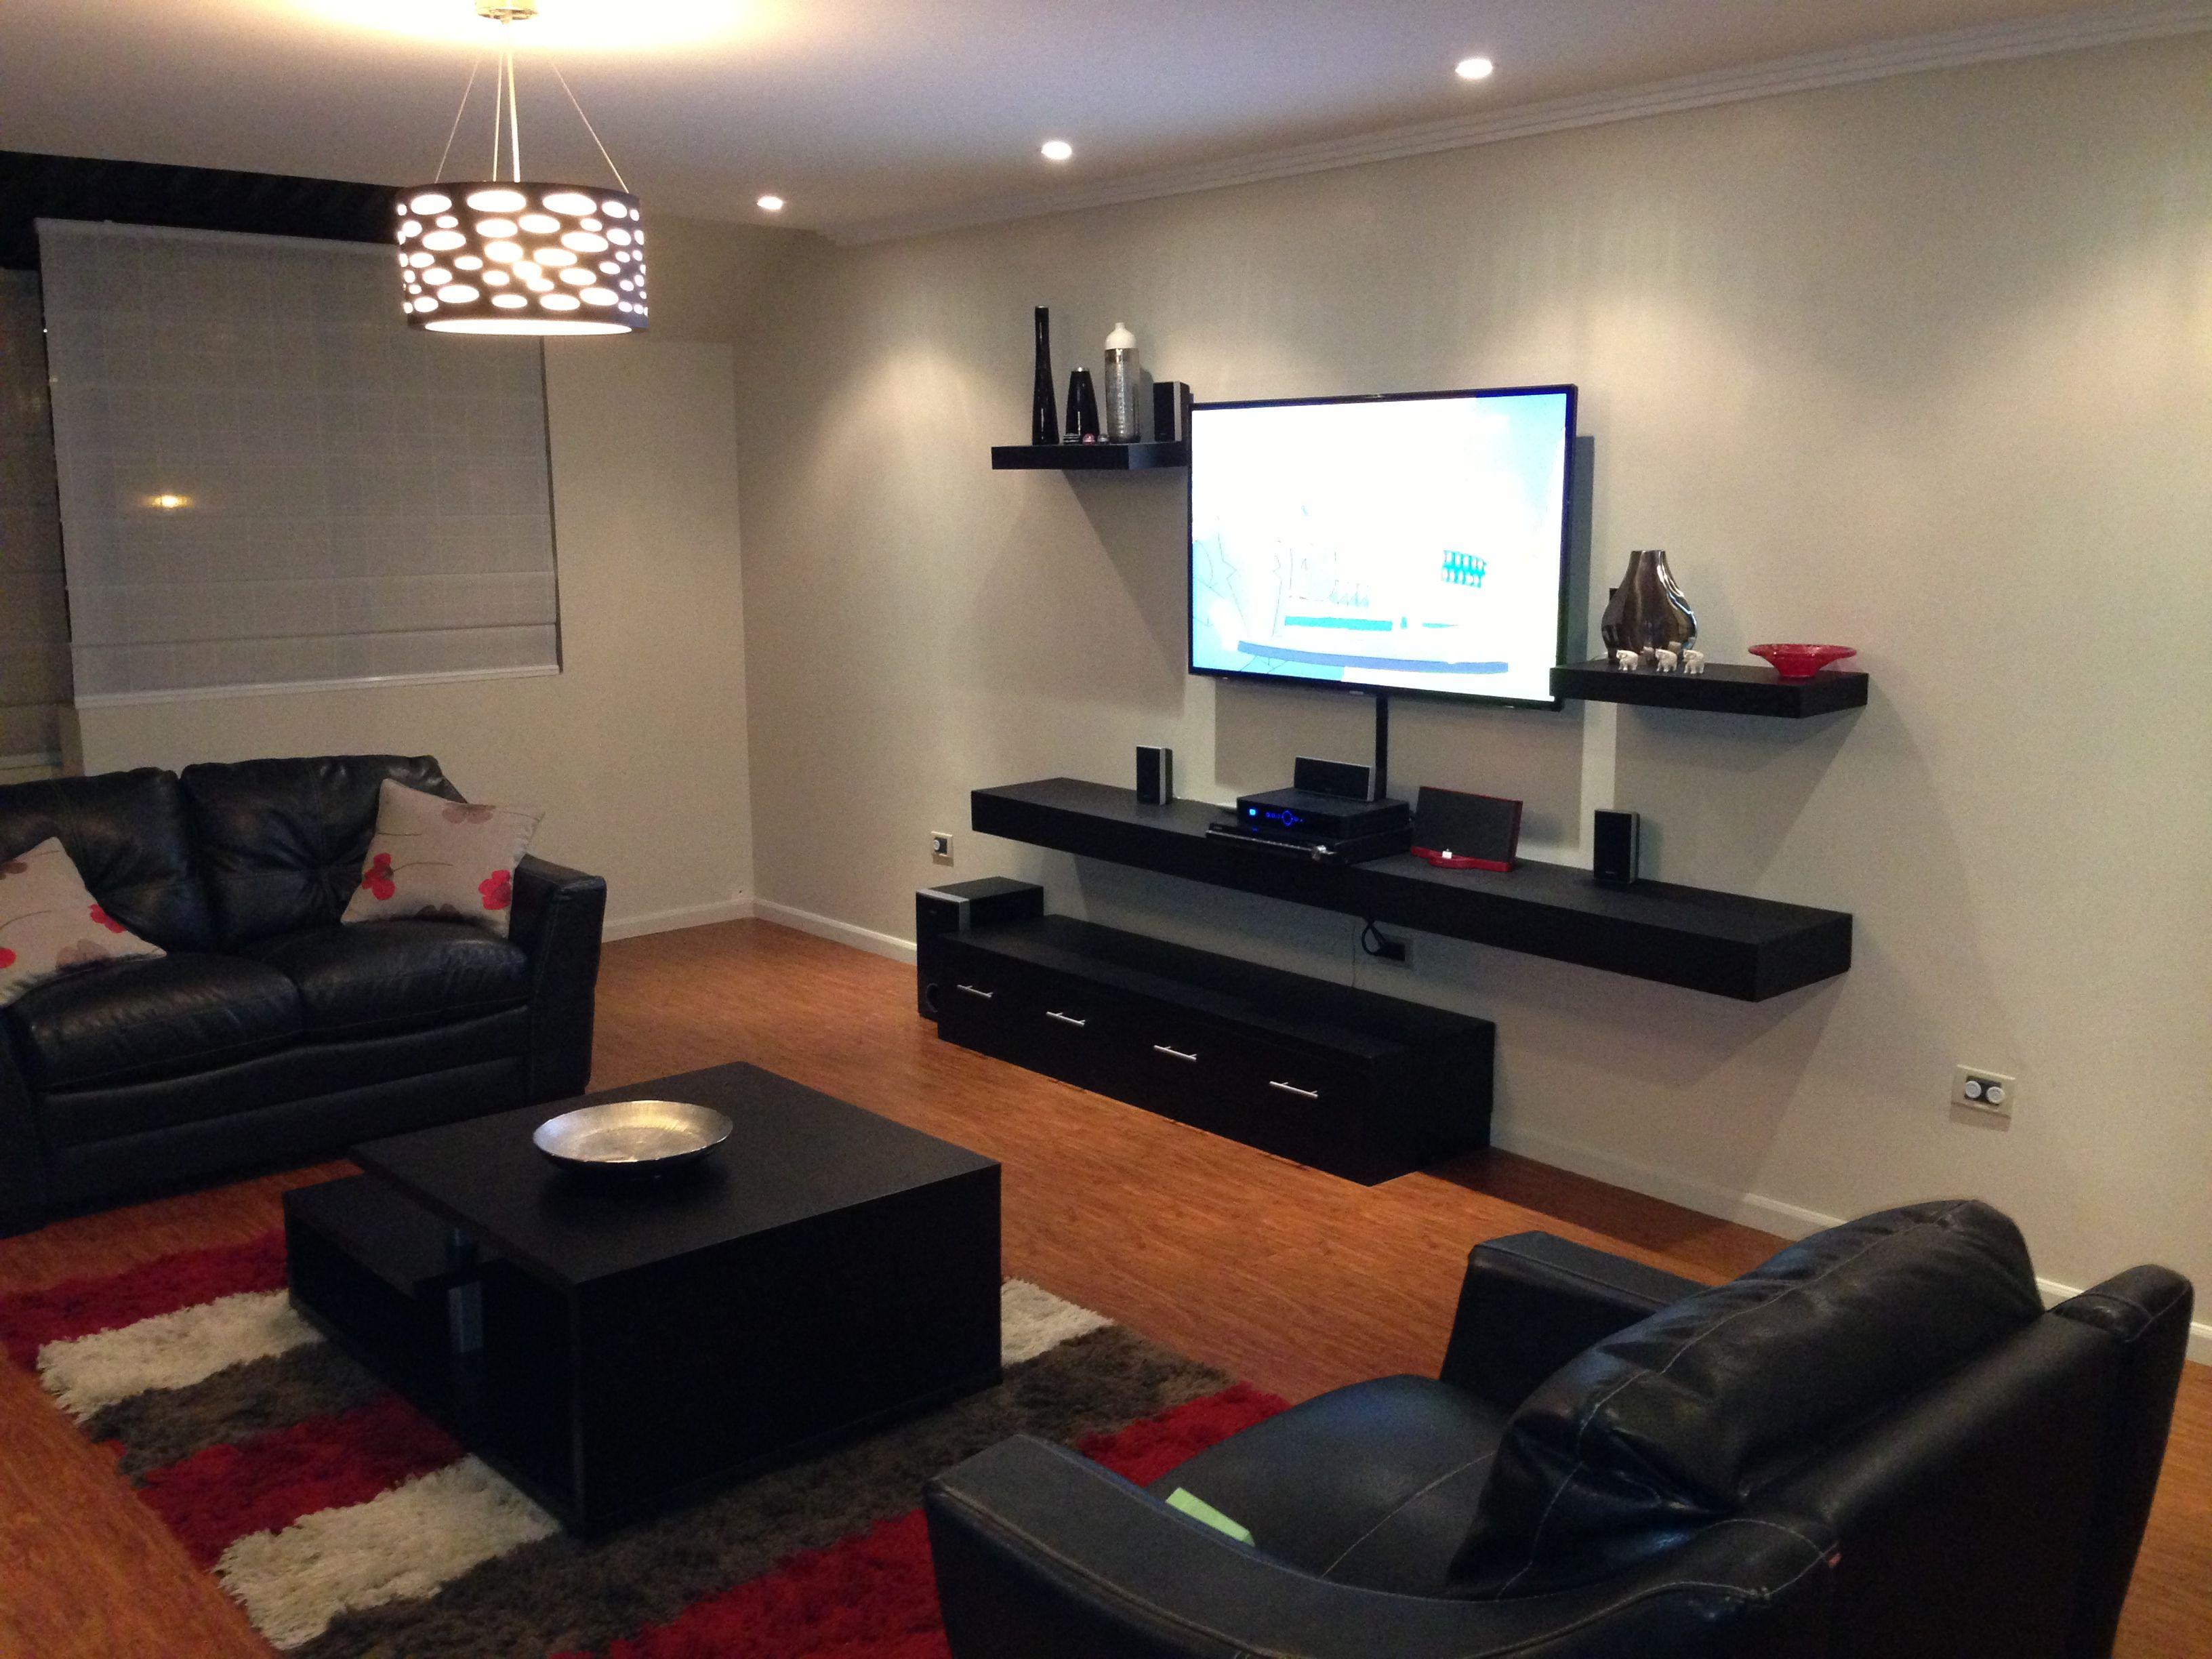 Mueble tv home pinterest satire room ideas and - Ideas mueble tv ...